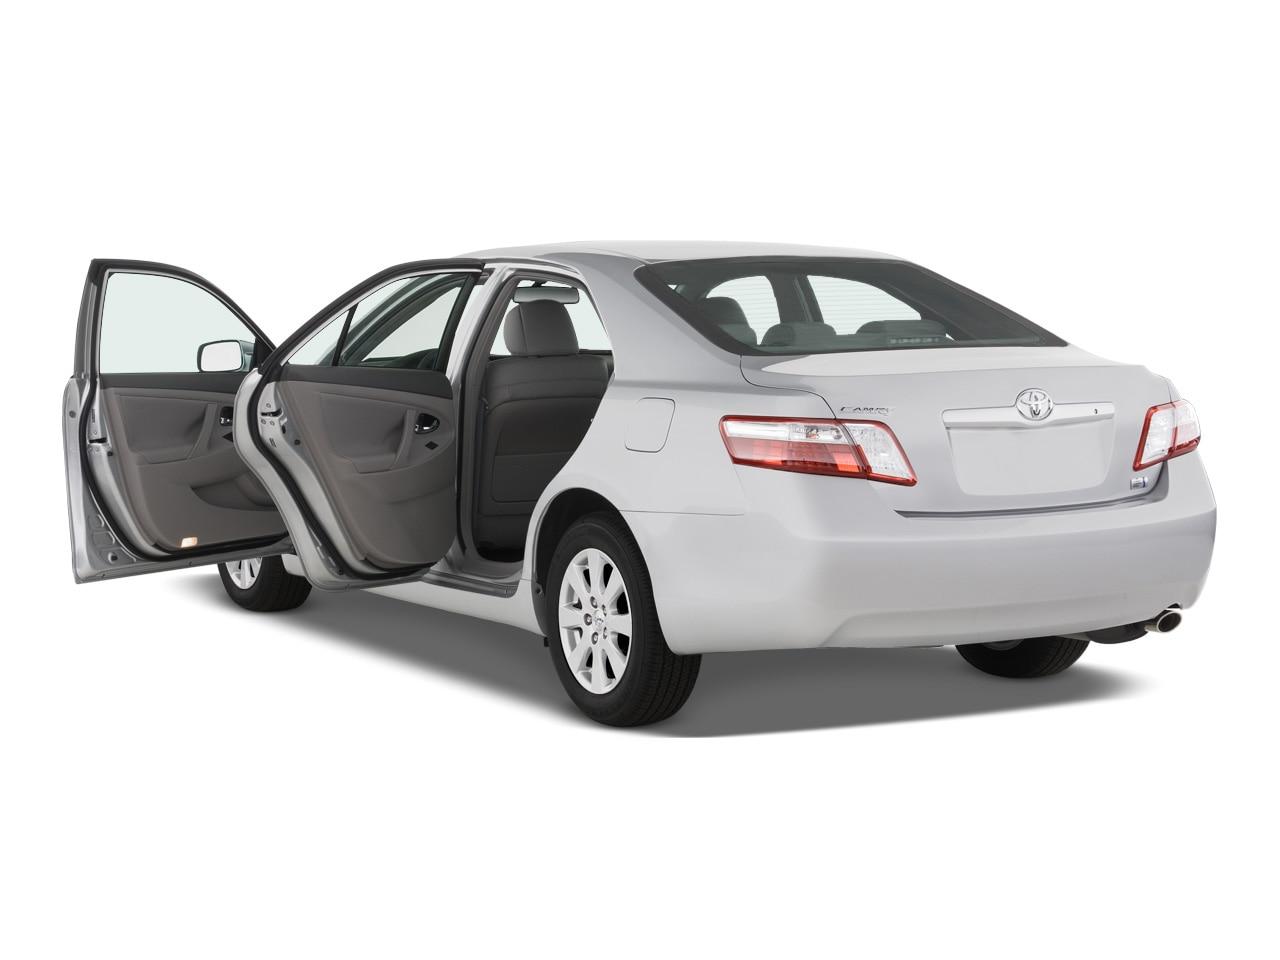 2002 toyota camry se manual sedan